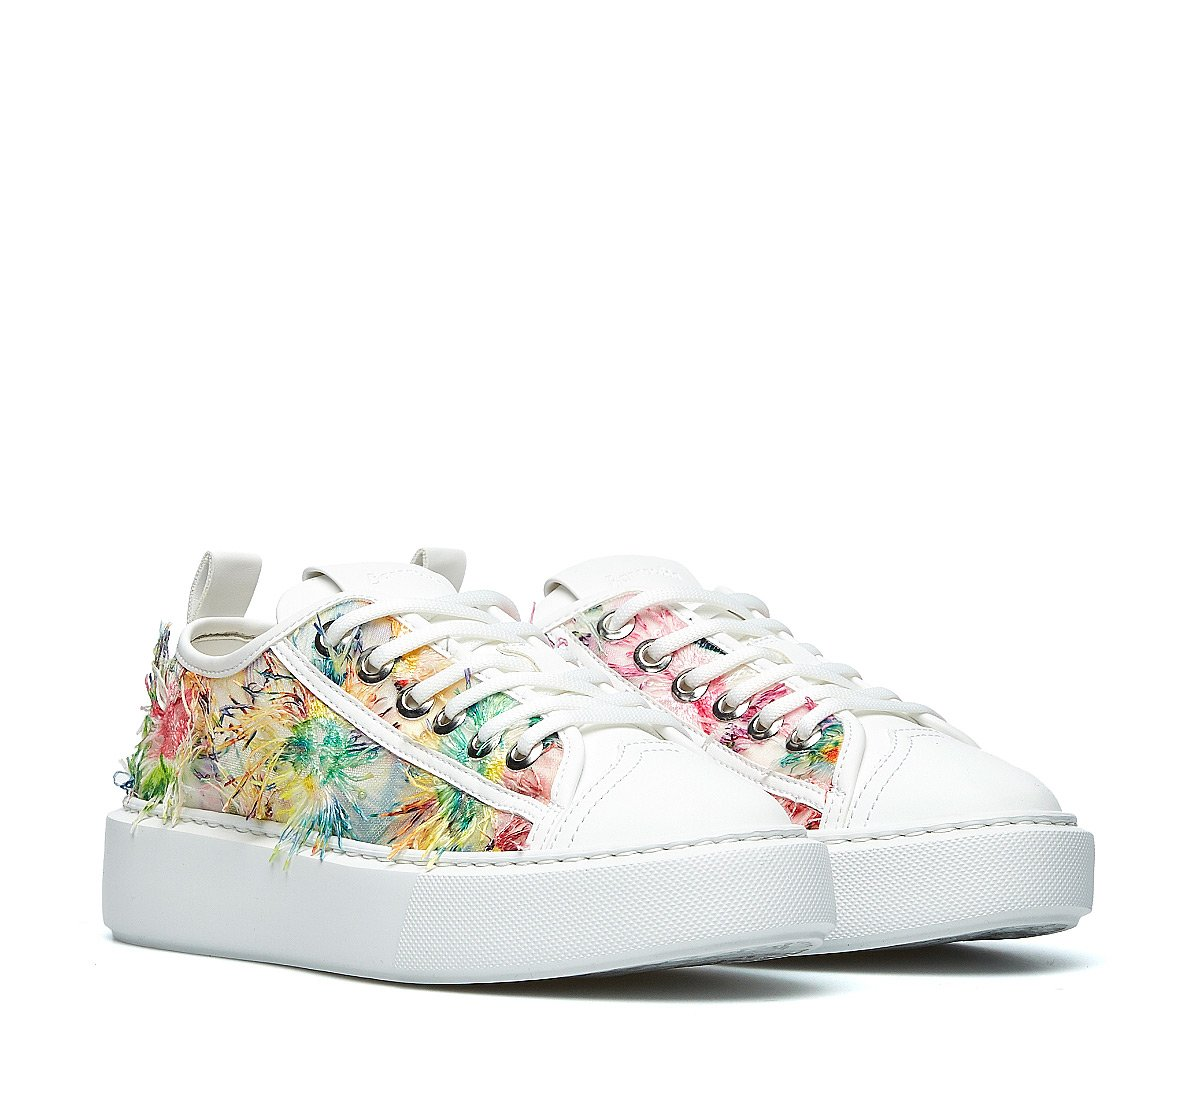 Barracuda Collins Sneakers